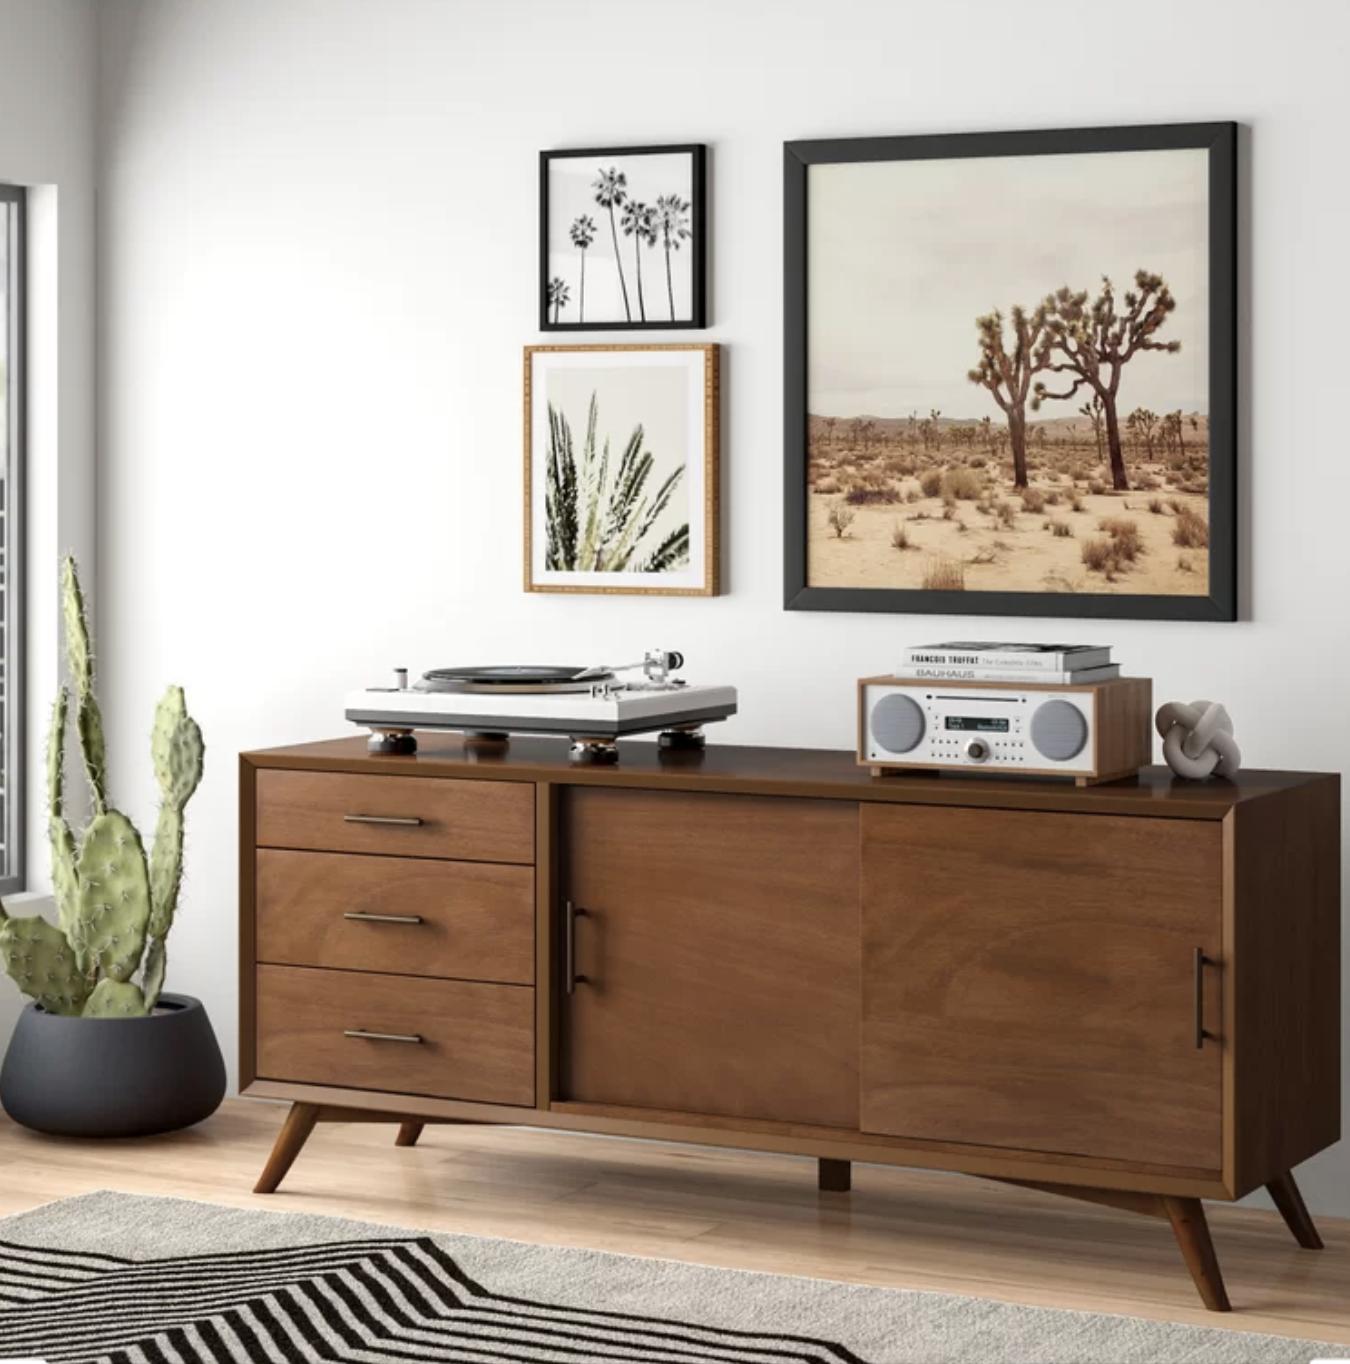 midcentury modern furniture  retro furniture in 2020